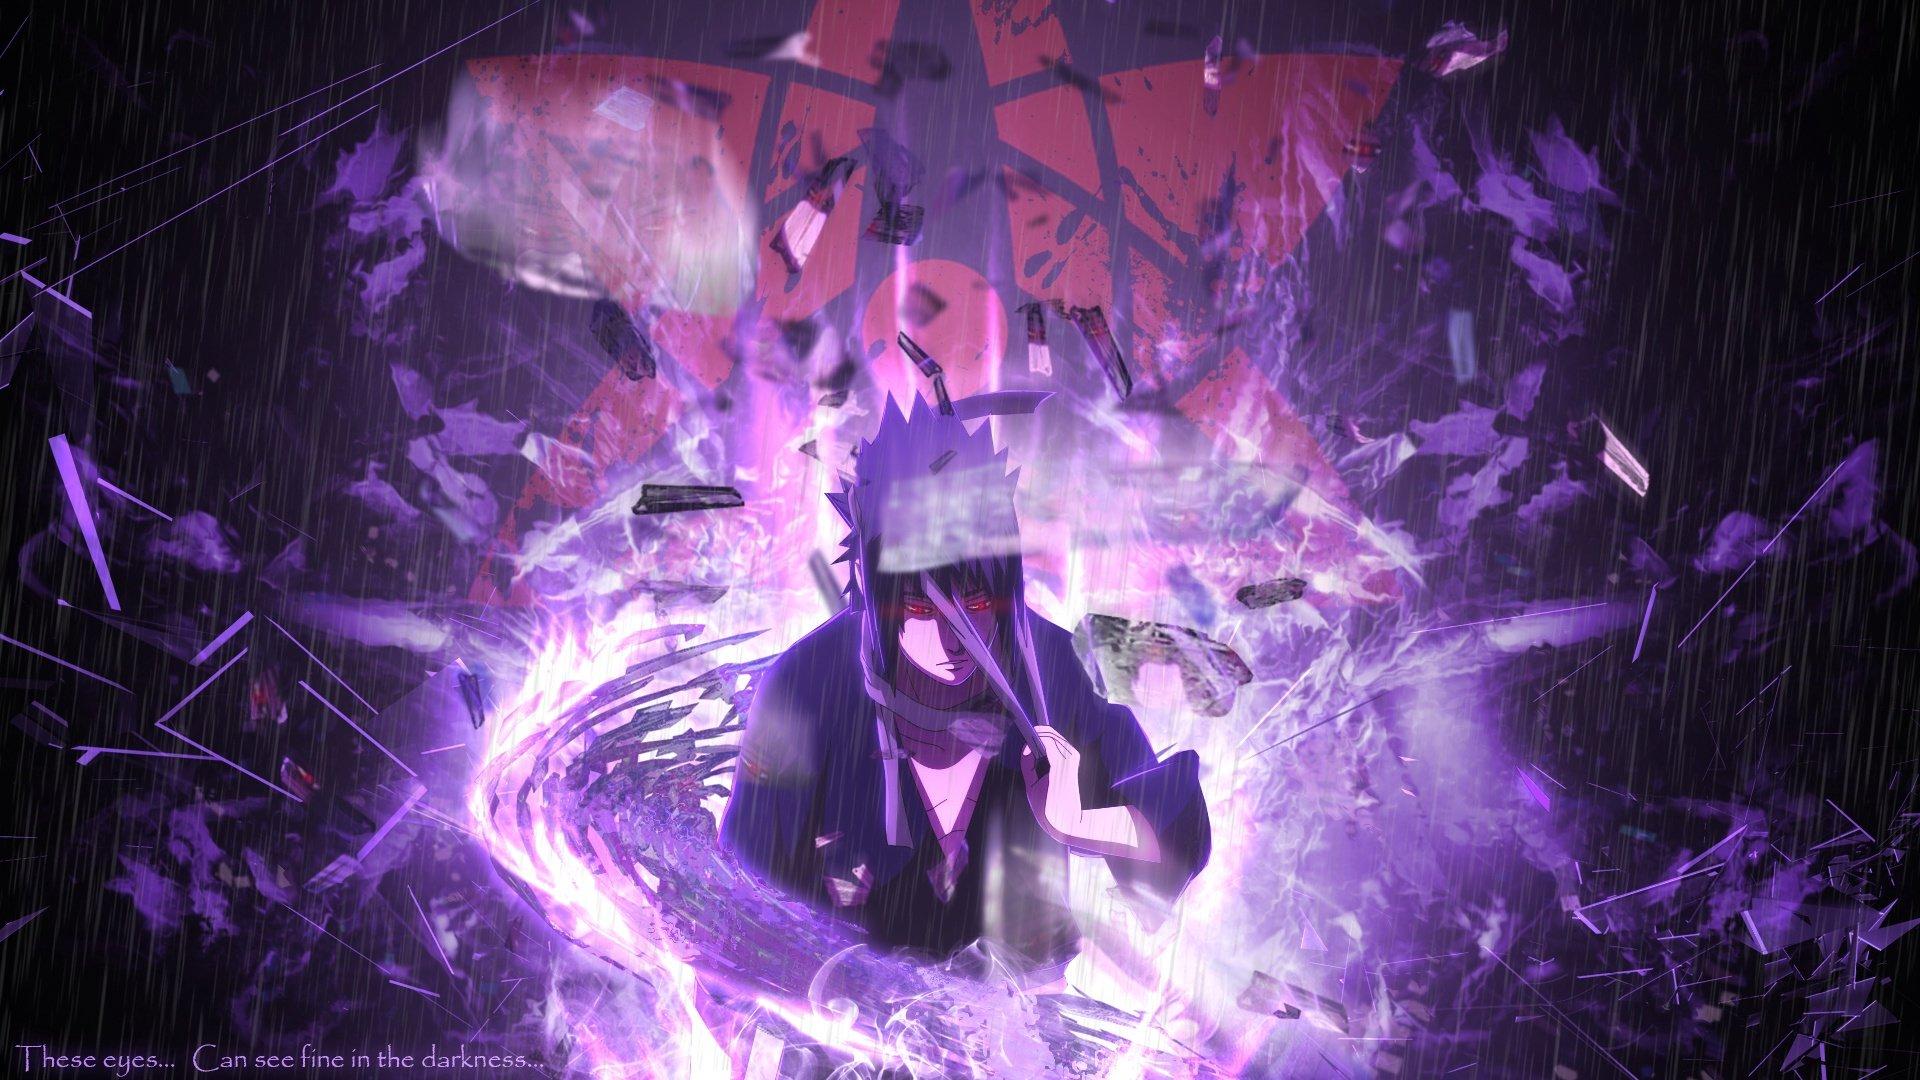 Awesome Sasuke Uchiha Free Wallpaper ID396148 For Full Hd 1080p Computer